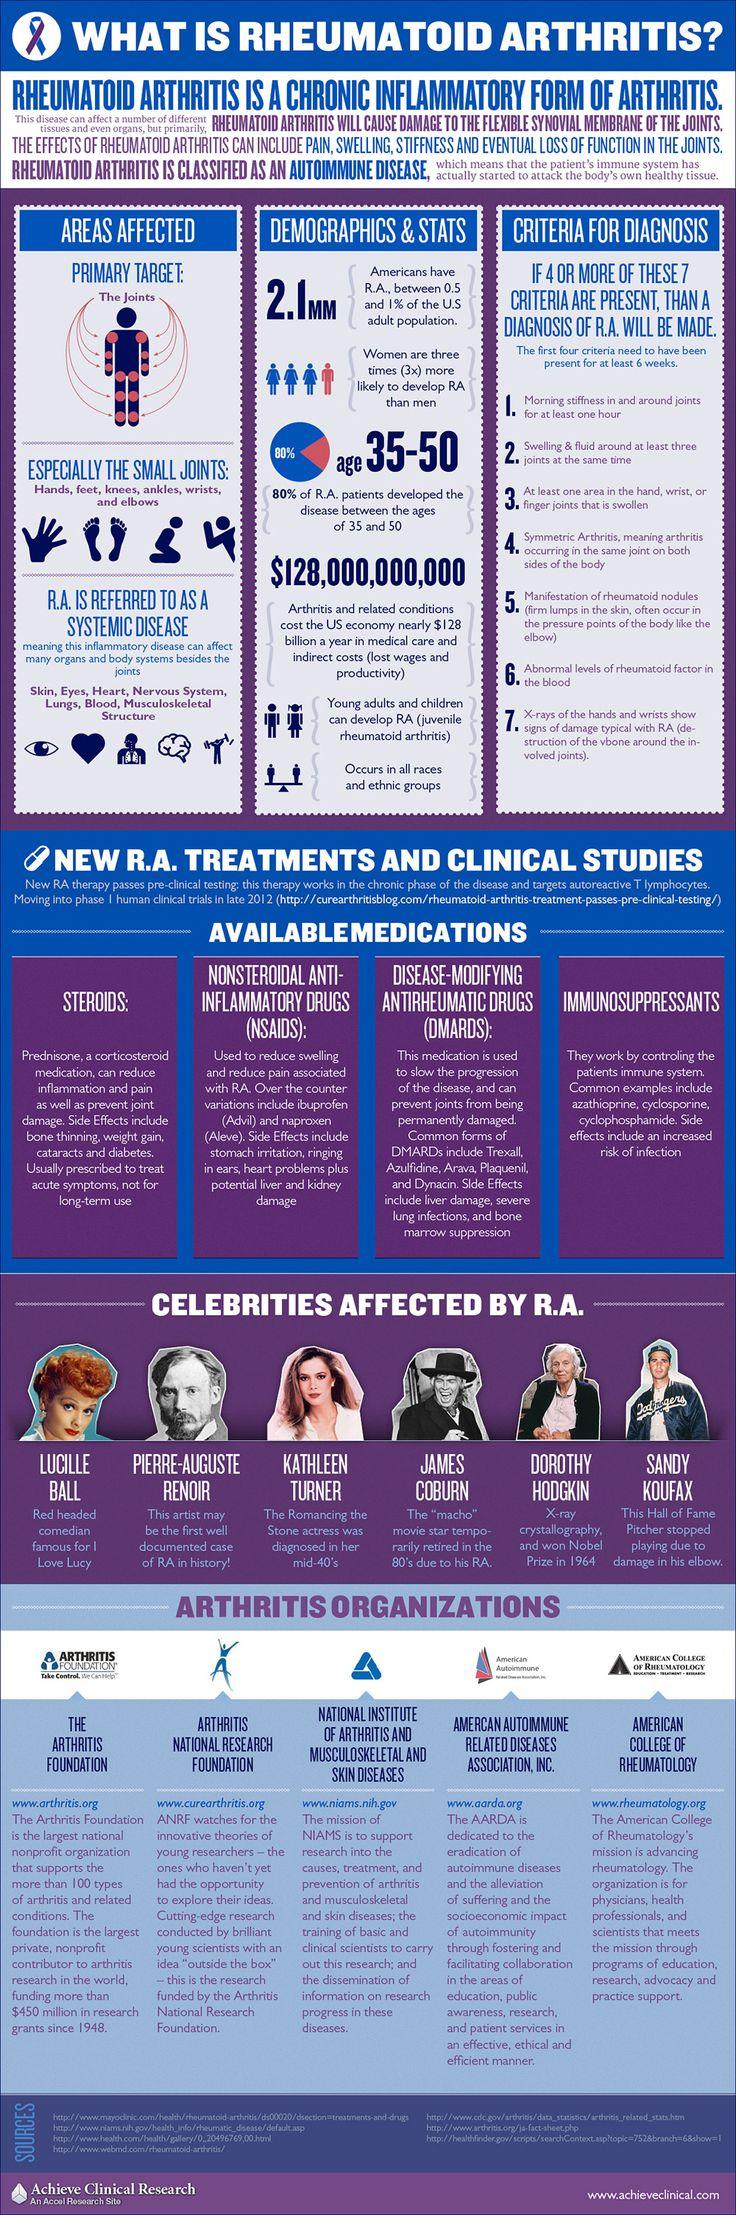 What Is Rheumatoid Arthritis Infographic